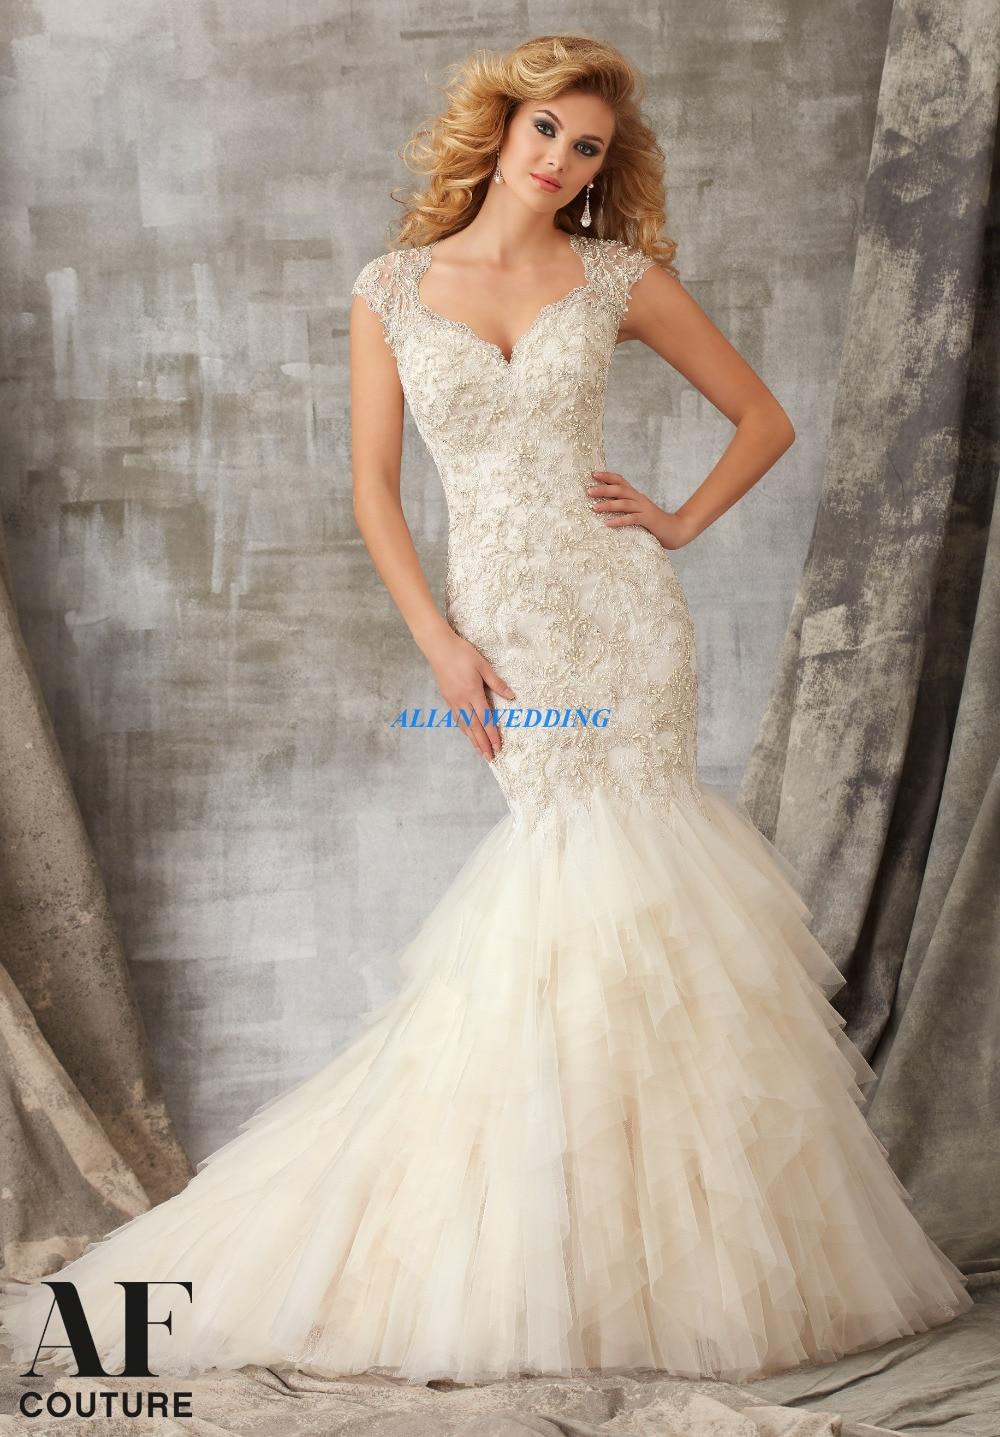 unique wedding dress different wedding dresses Romantic Cap Sleeve Wedding Dress With Cameo Back